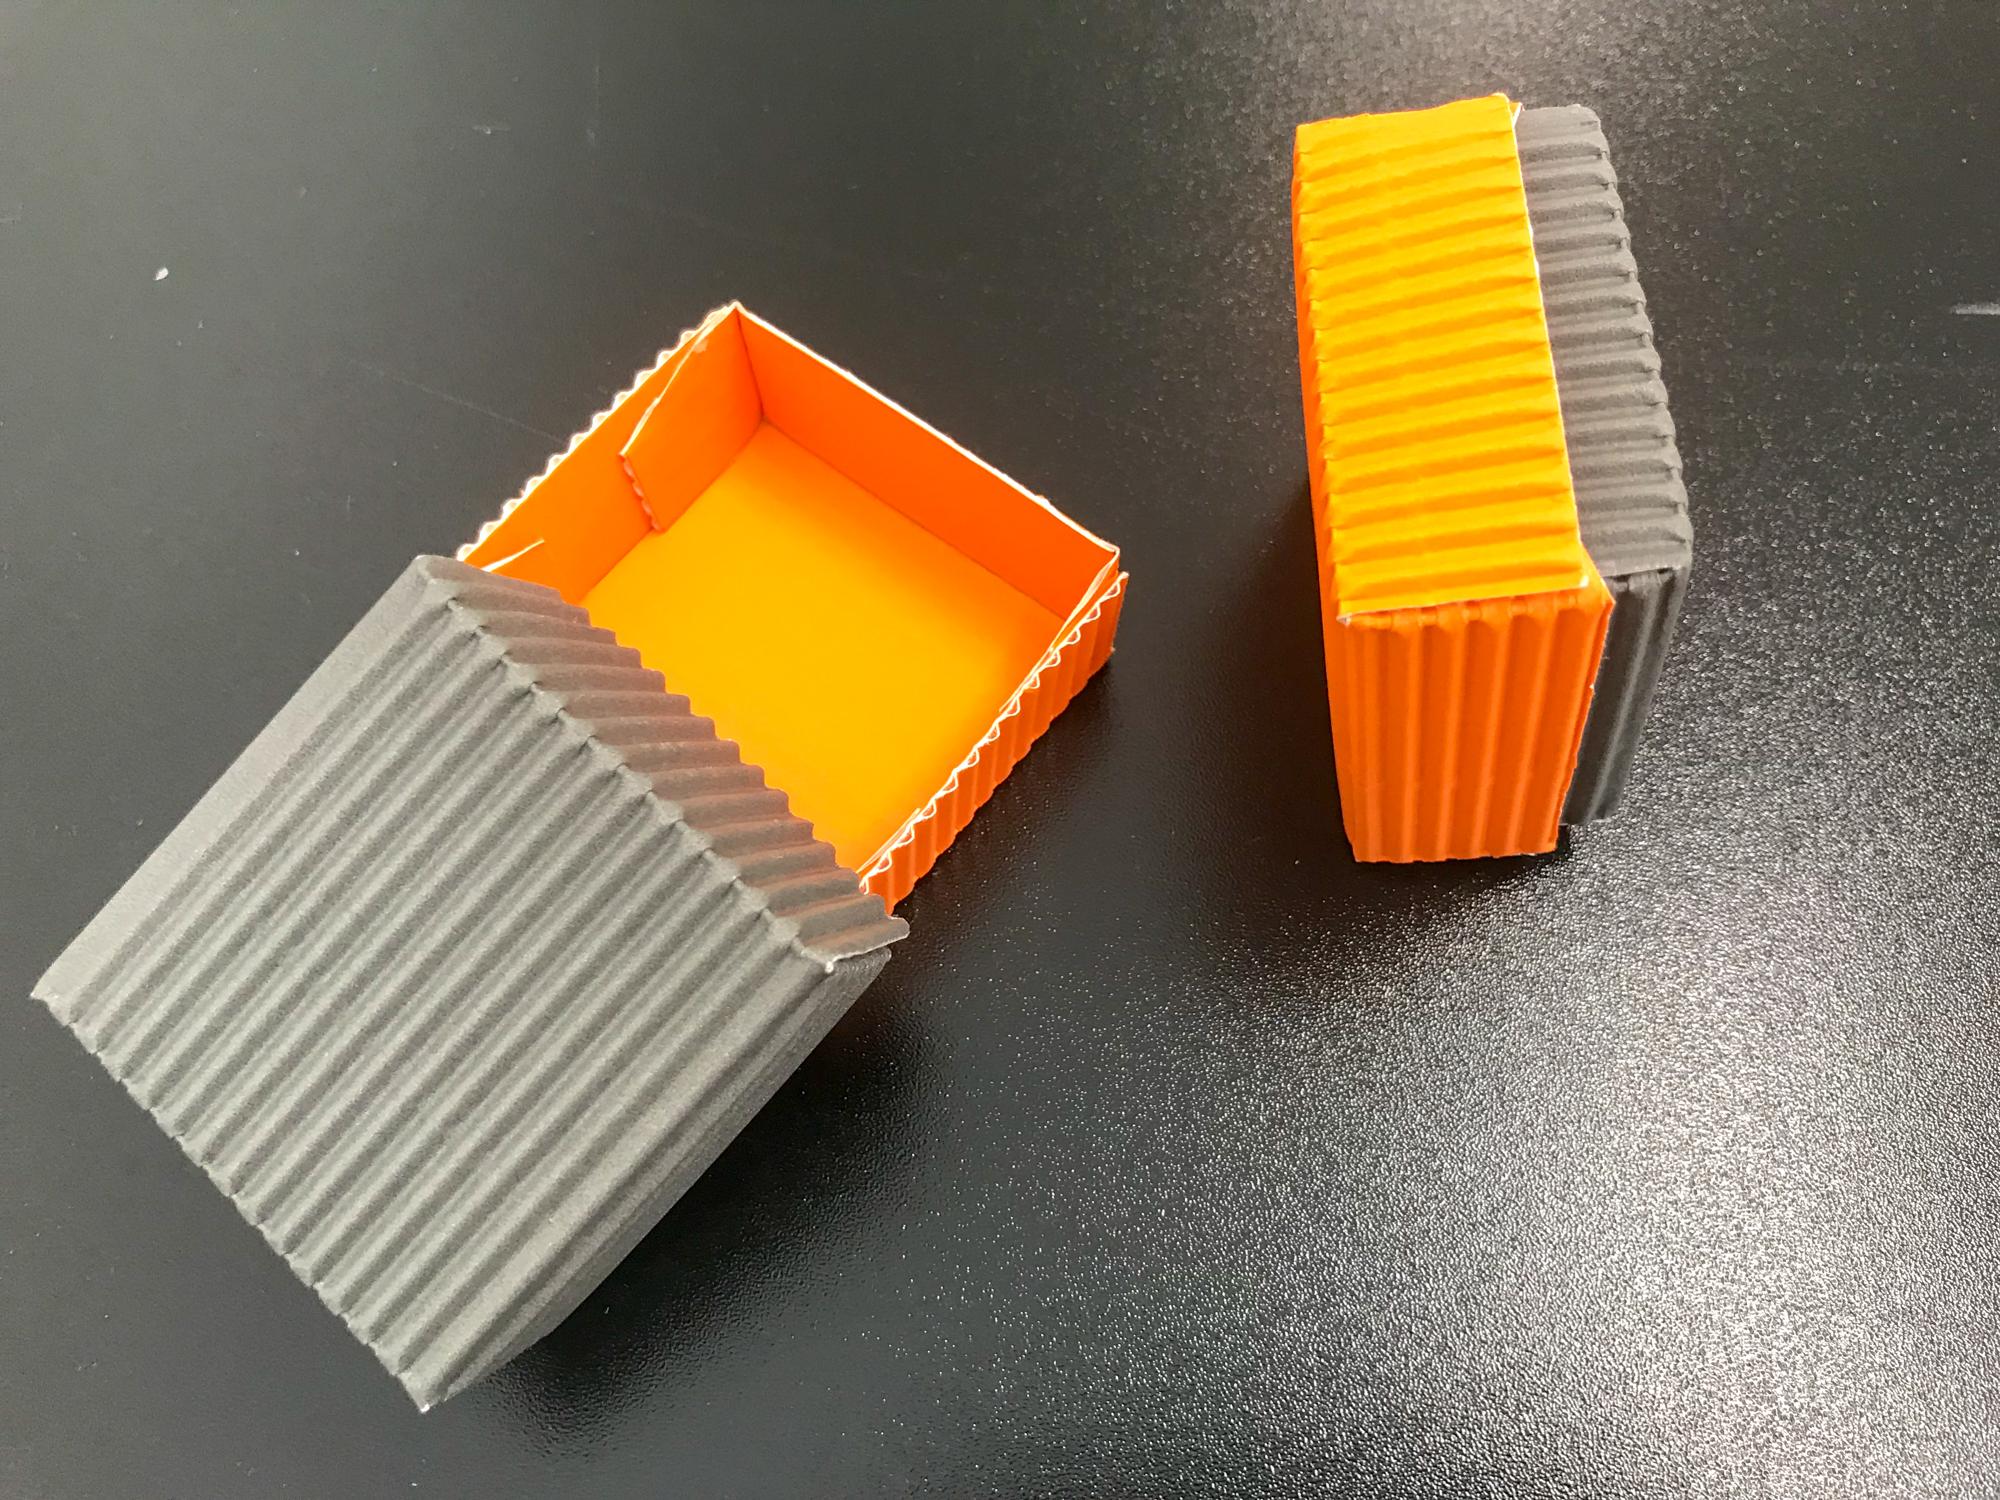 Handgefertigte Verpackung (c)decoDesign-peters-2